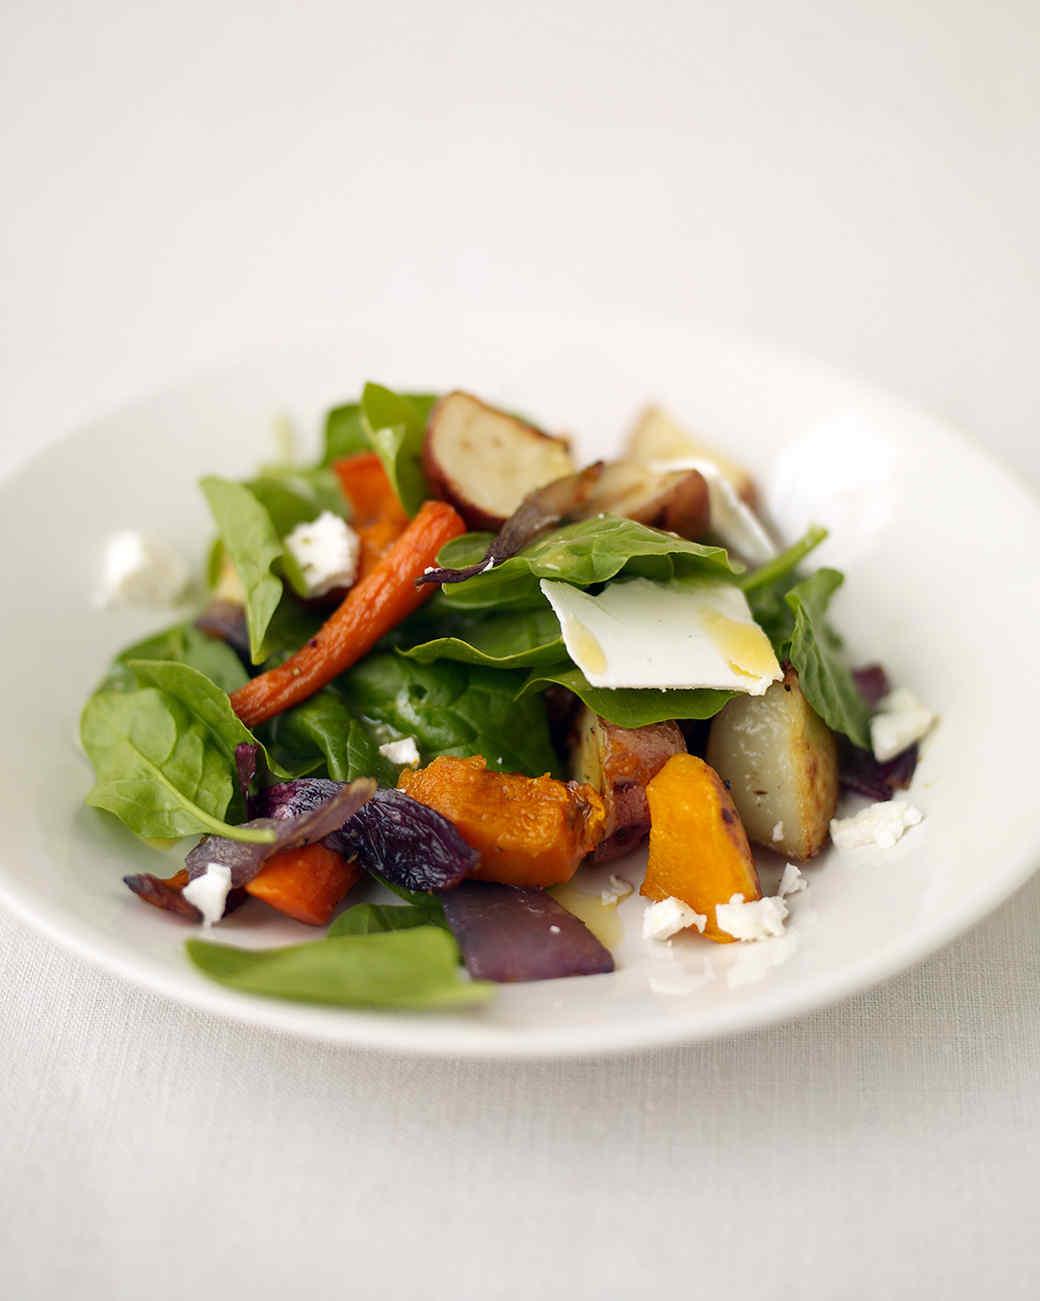 edf_oct06_howto_salad.jpg